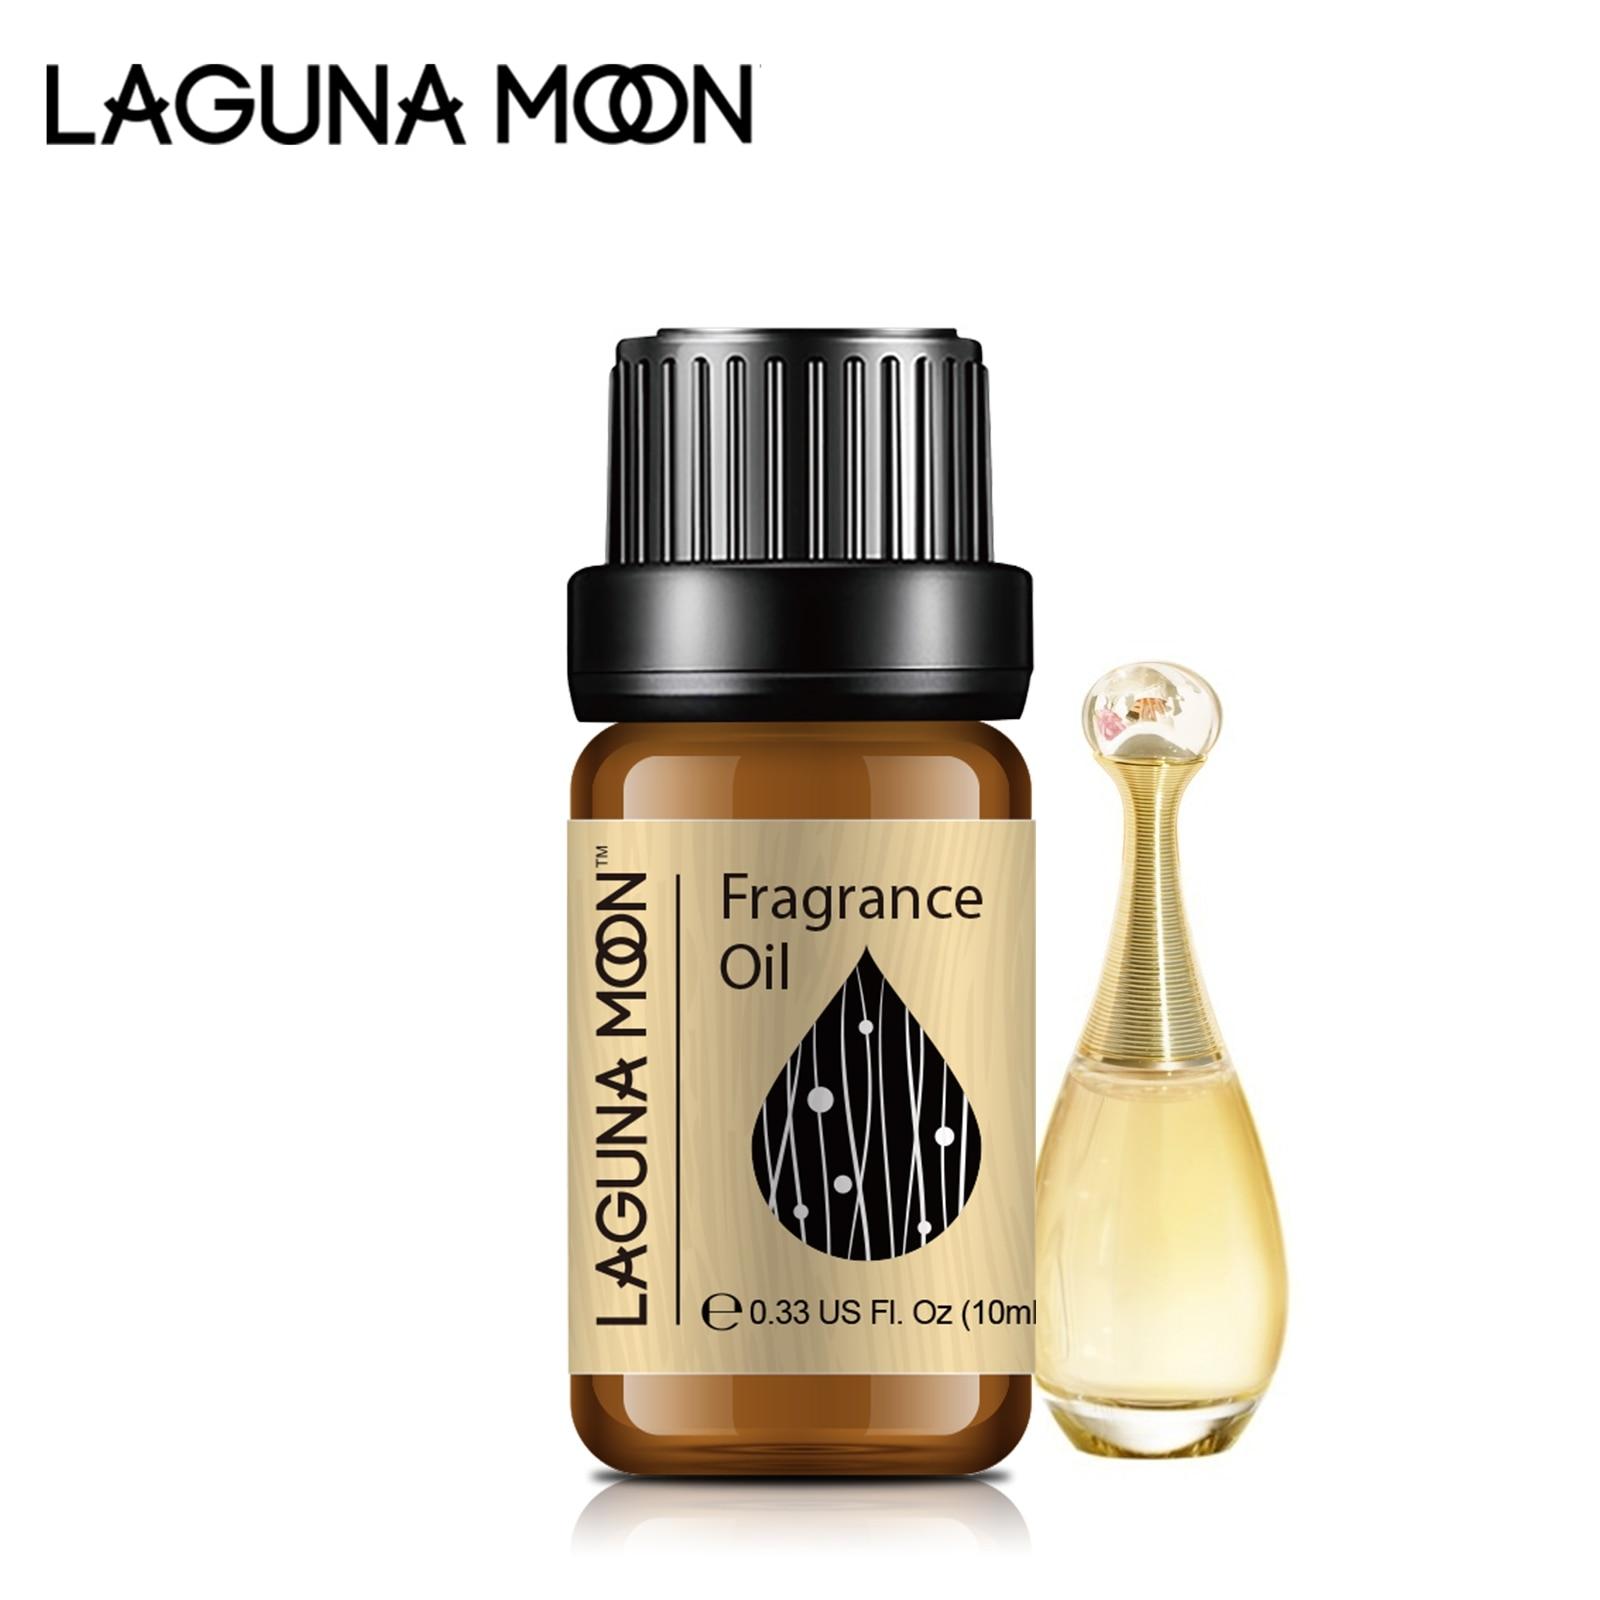 Lagunamoon 10ml Aventus Jadore DIY Fragrance Oil Strawberry Orange Blossom Oil For Candle Soap Making Perfume Air Fresh Diffuser-1